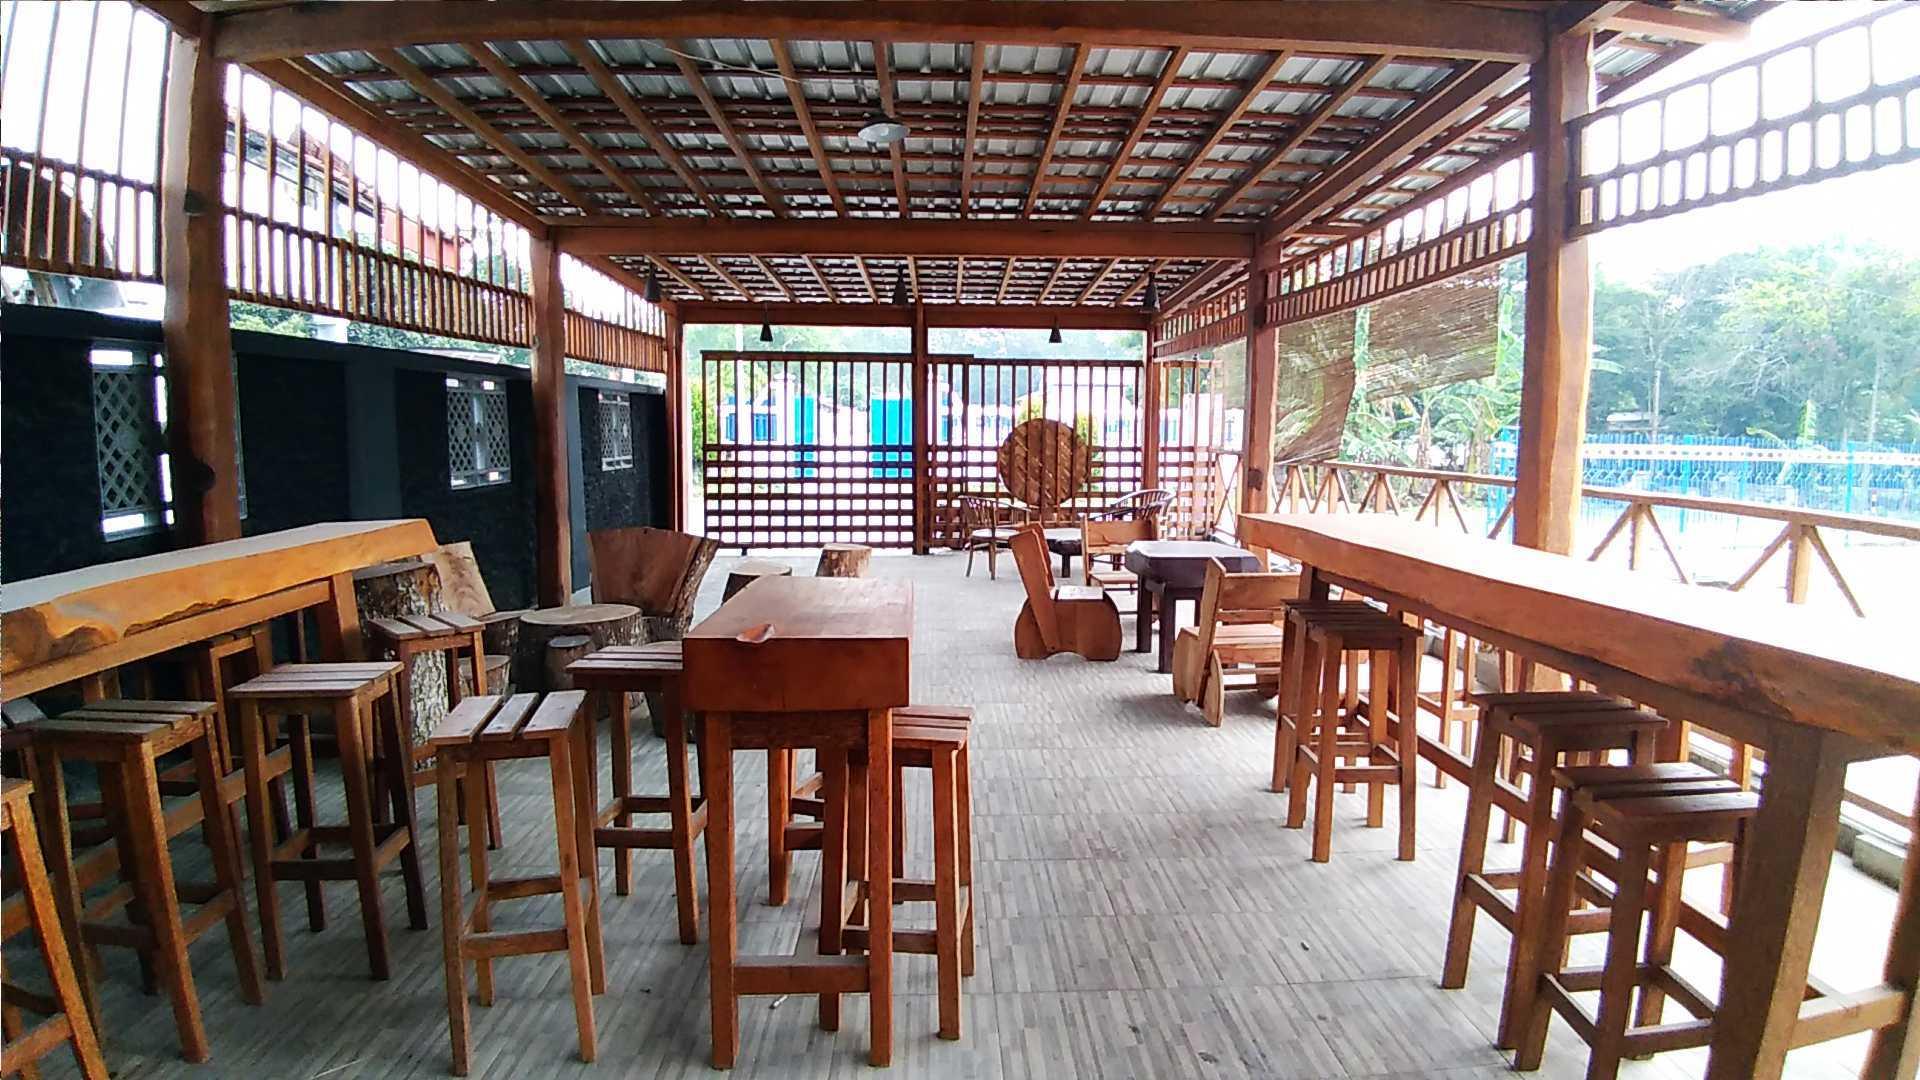 Epicnesia_Architect Warung Mbok Ti Malang, Jawa Timur, Indonesia Kediri, Jawa Timur, Indonesia Aditya-Yuni-Prasetya-Bakso-Tiga-Berlian   64301